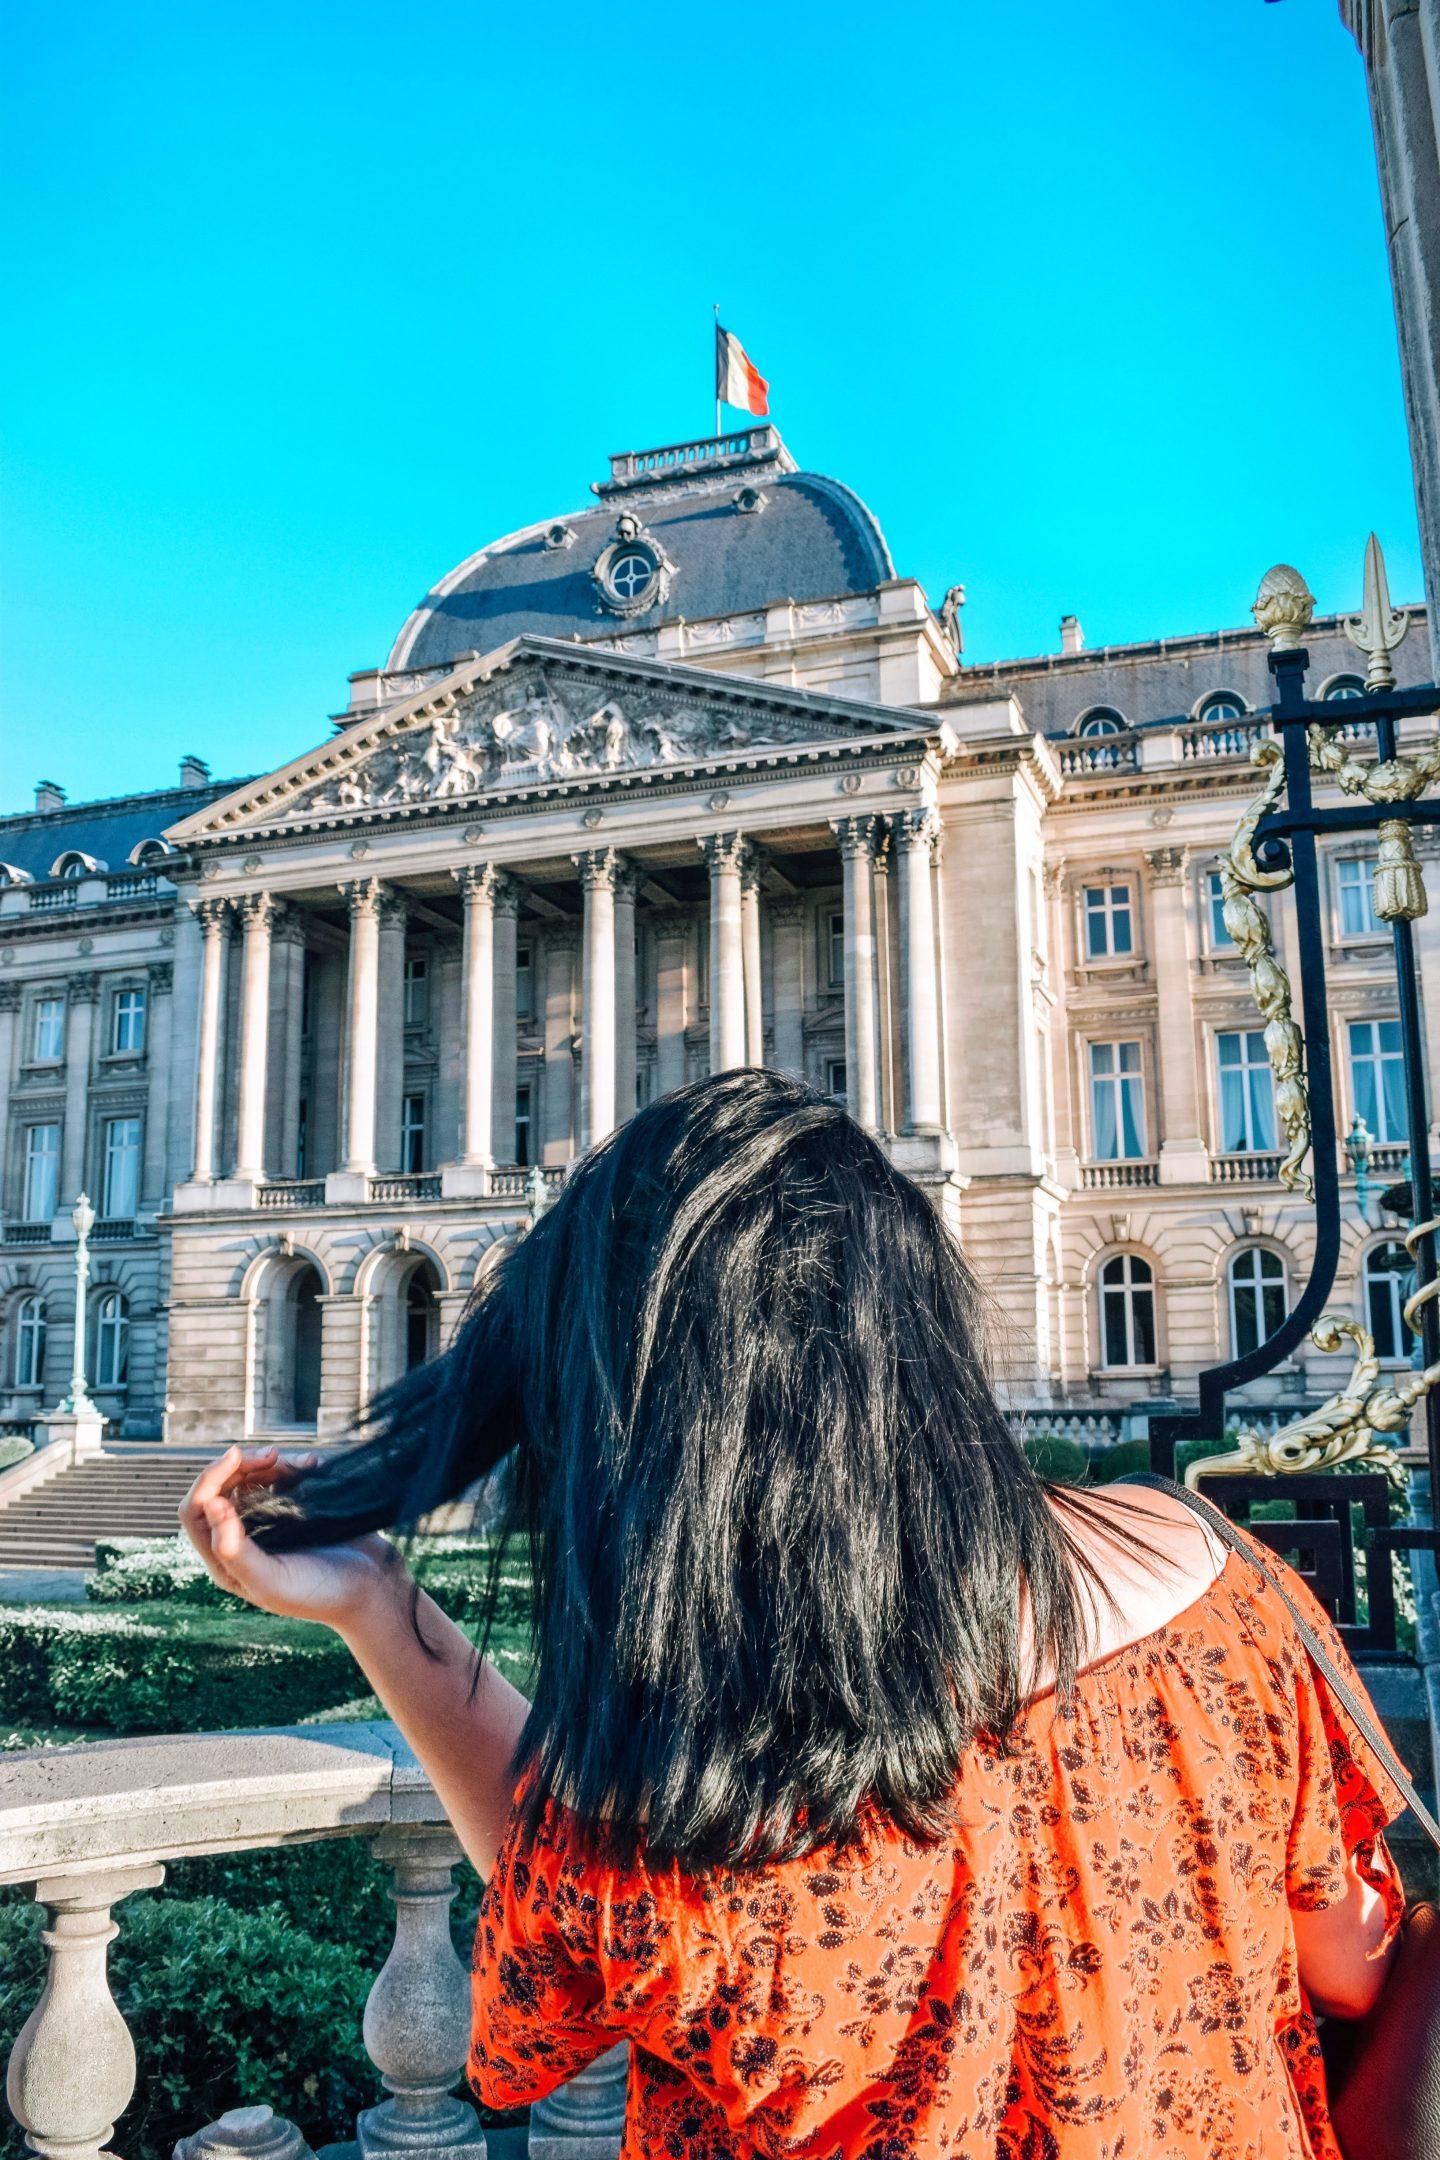 brussels-belgium-royal-palace-romantic-destinations-europe